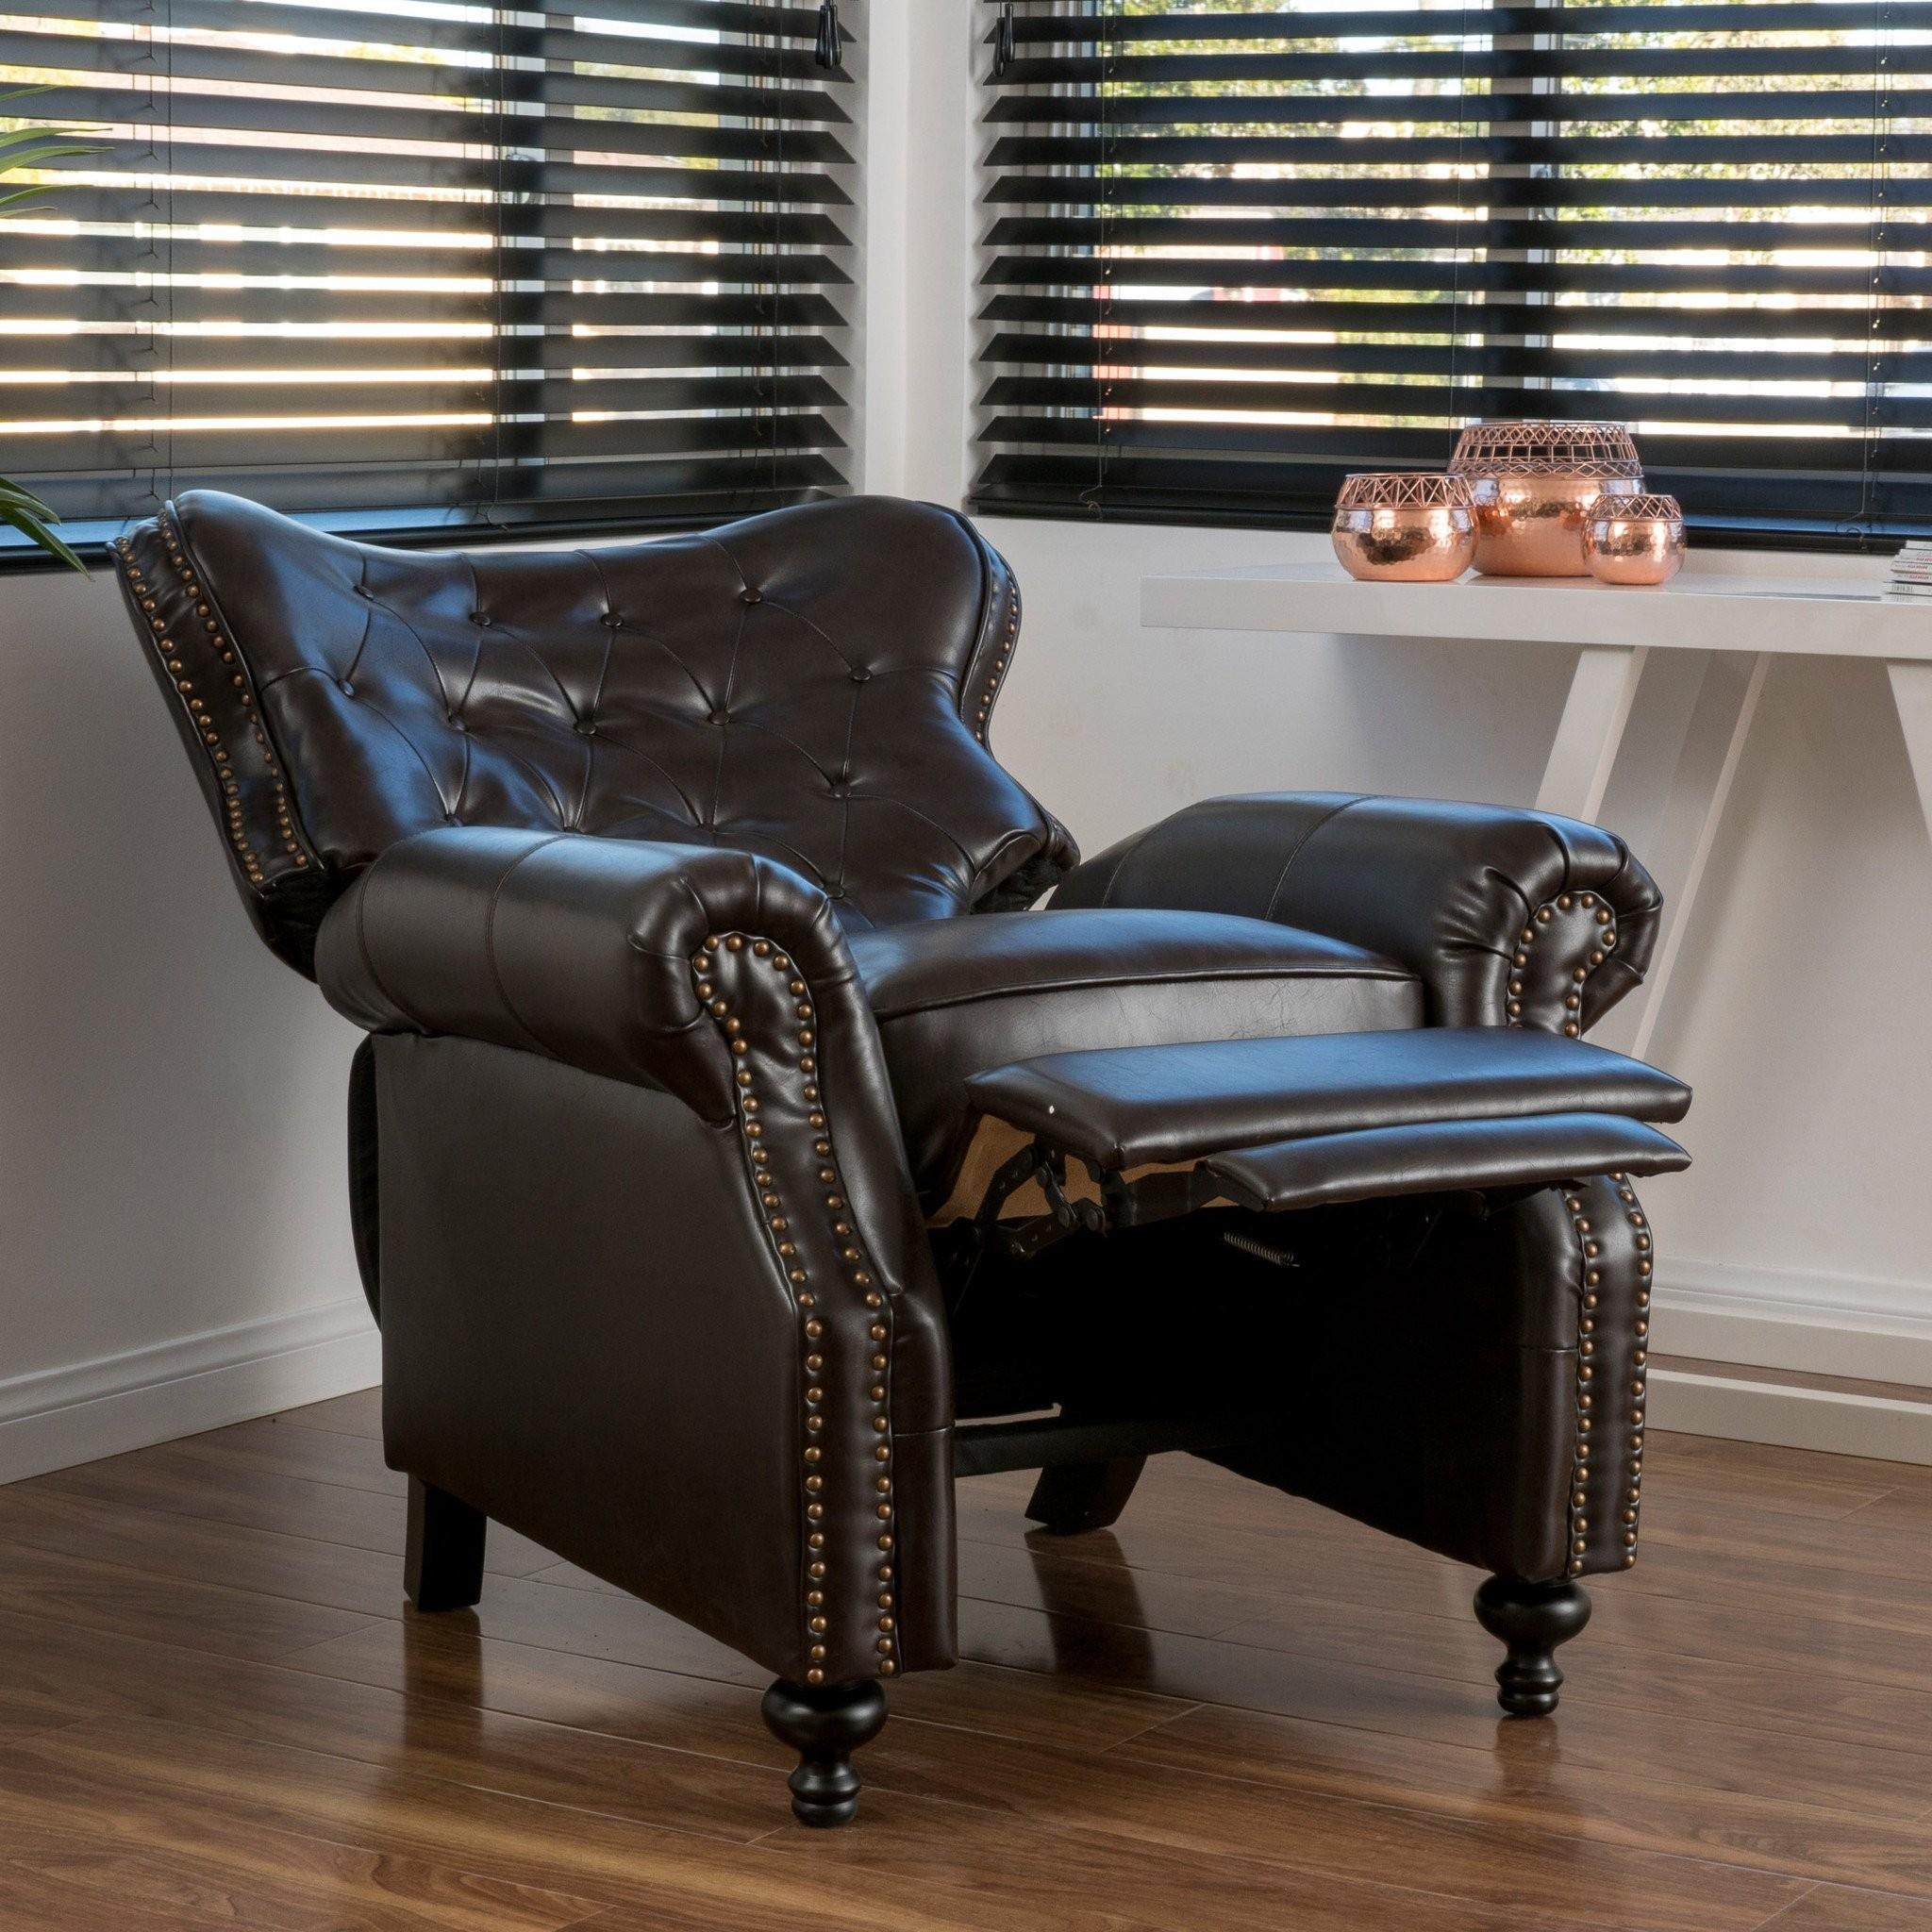 Waldo Brown Leather Recliner Club Chair